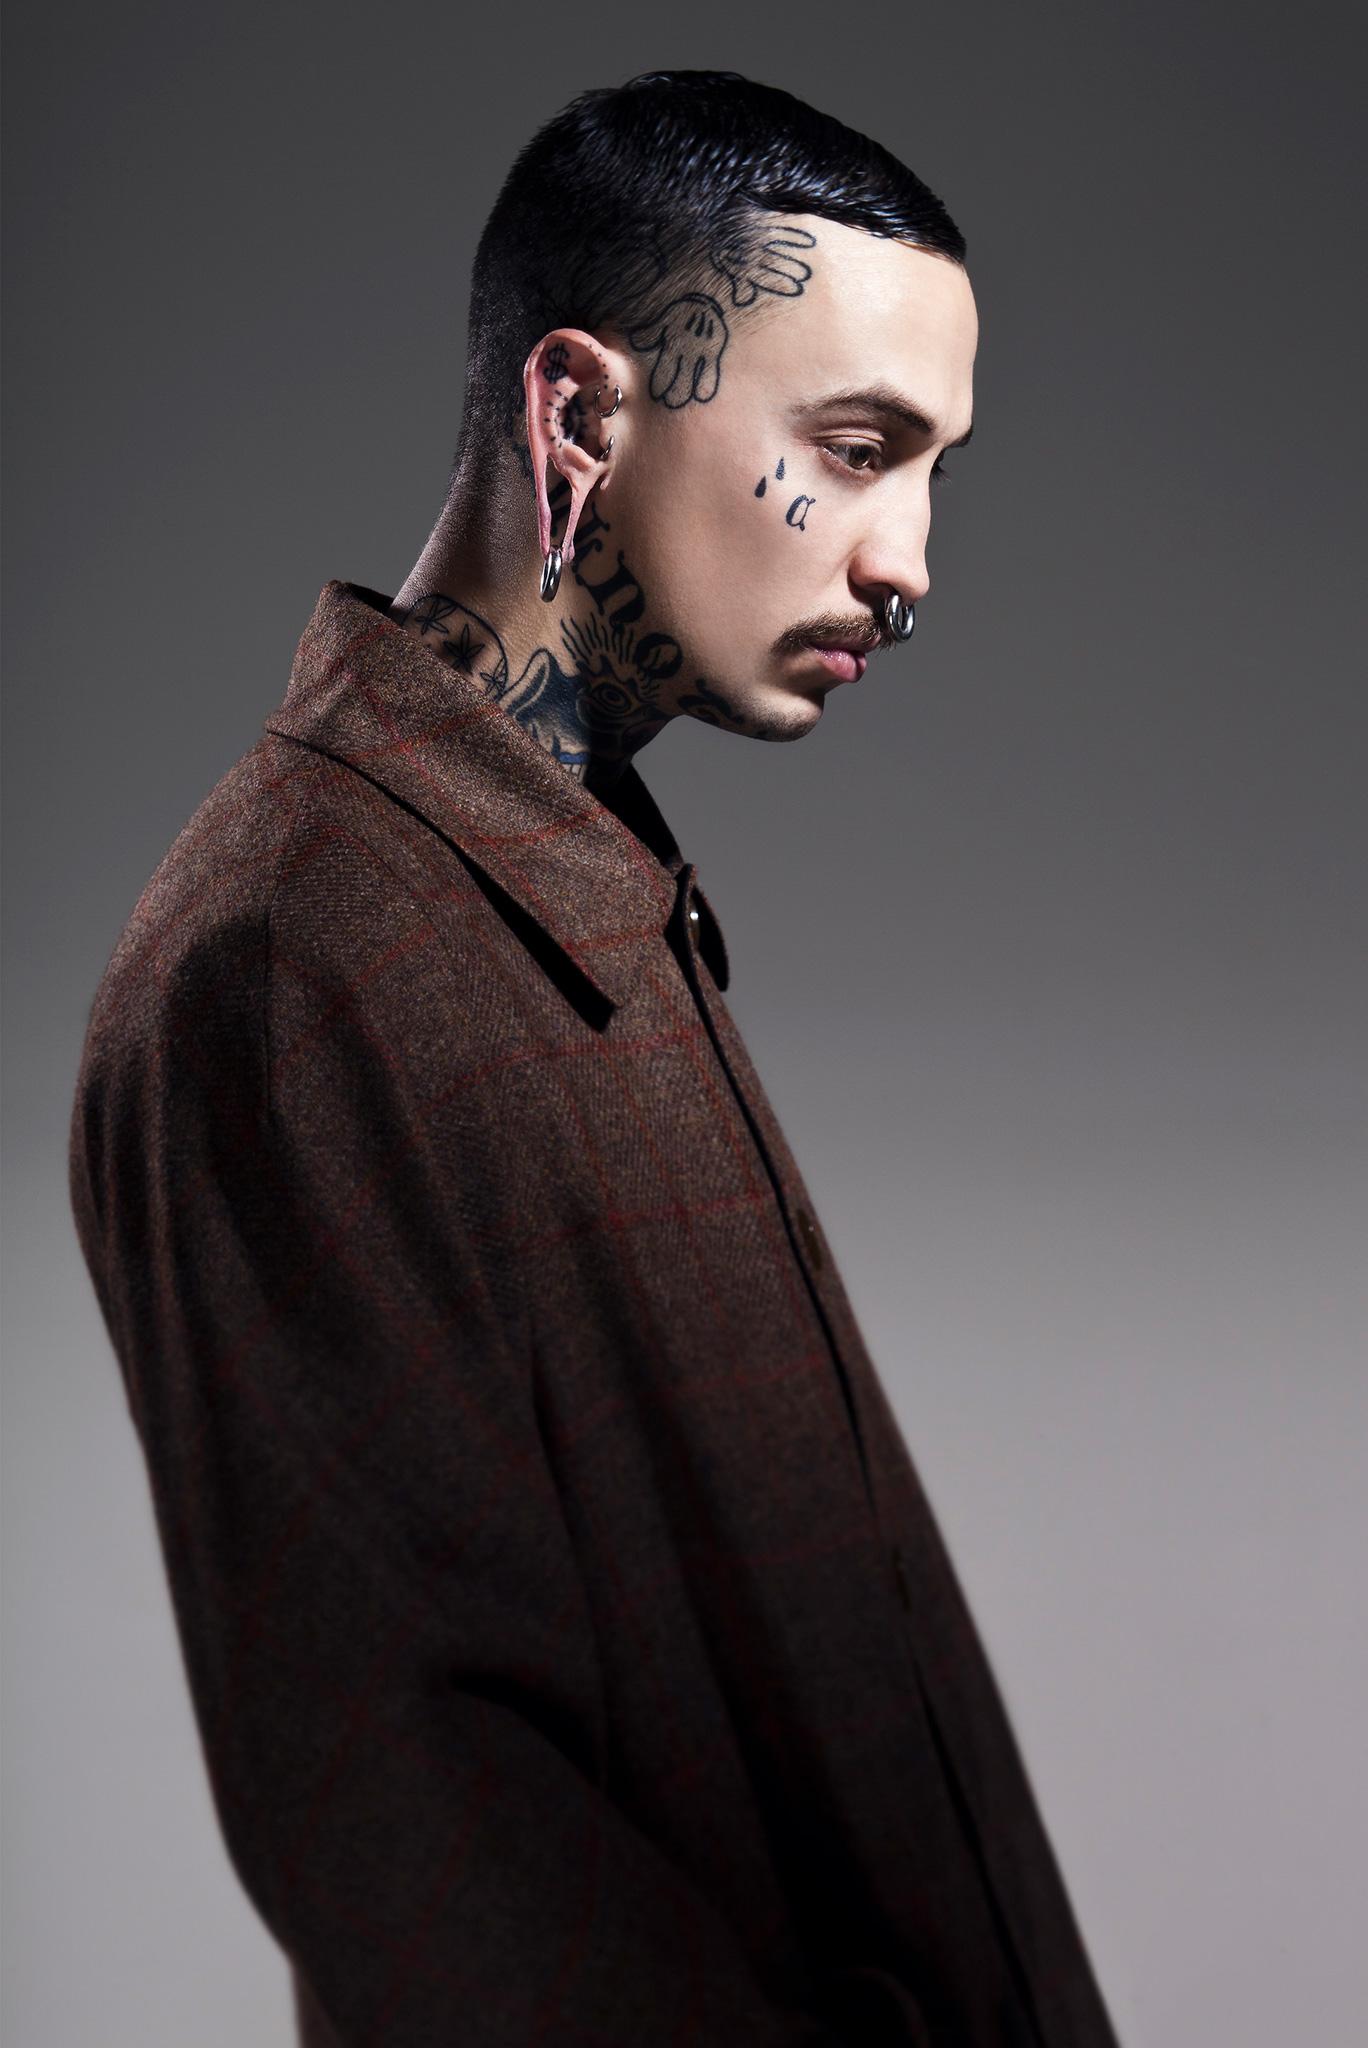 Rich Evan 'Dicky' | Tattoo Artist